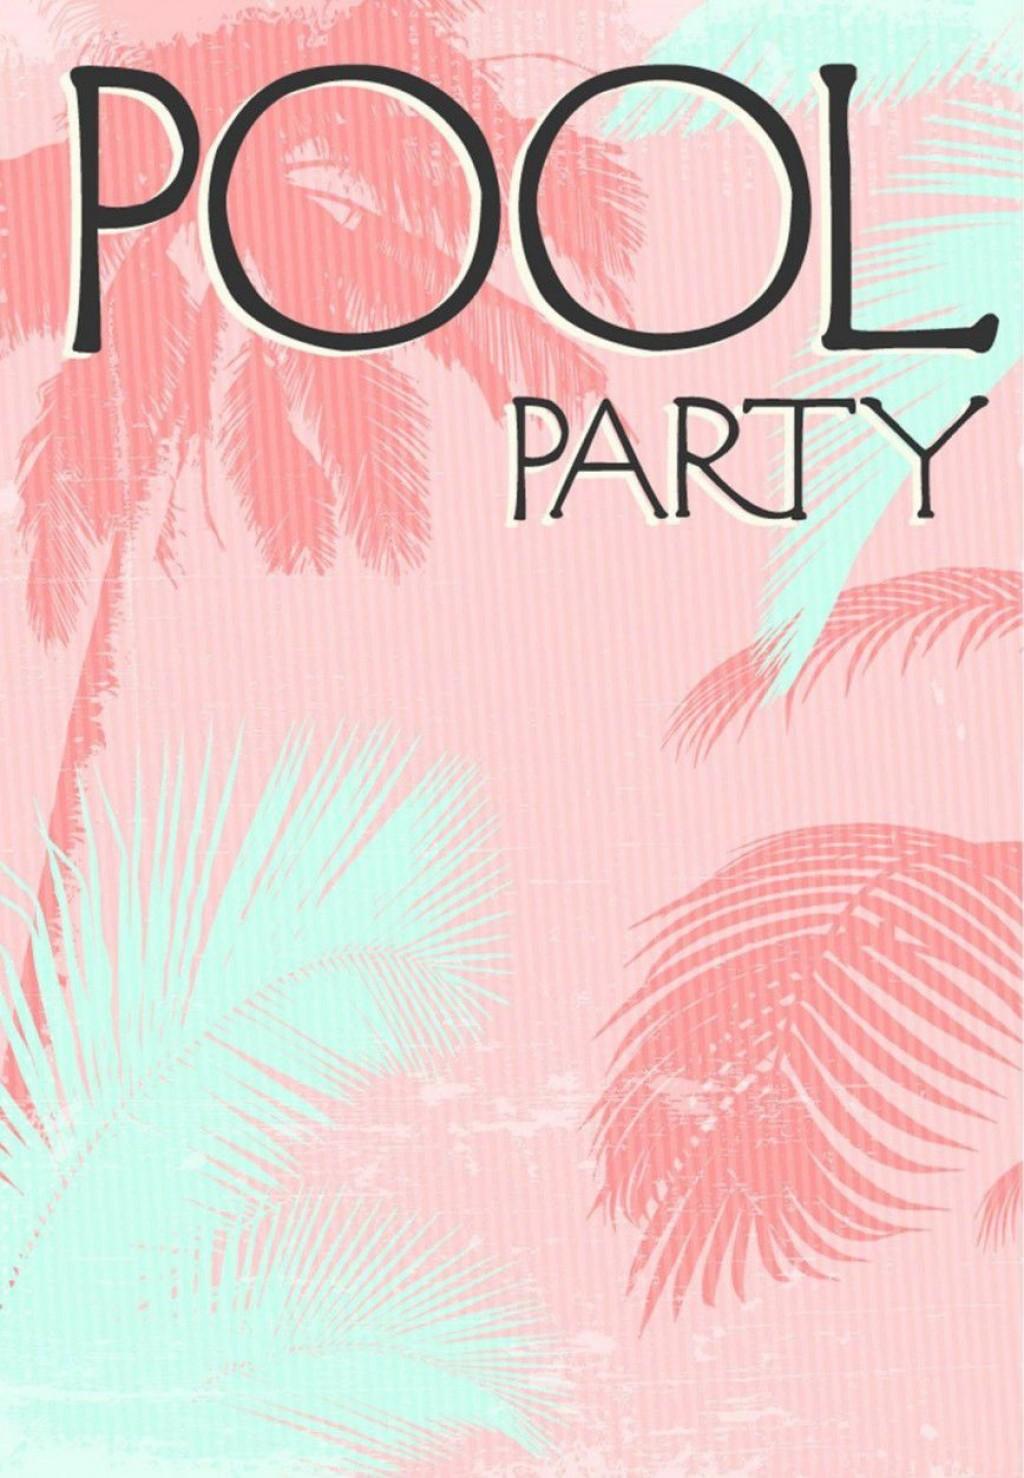 000 Wonderful Free Pool Party Invitation Template Printable Photo  Card SummerLarge